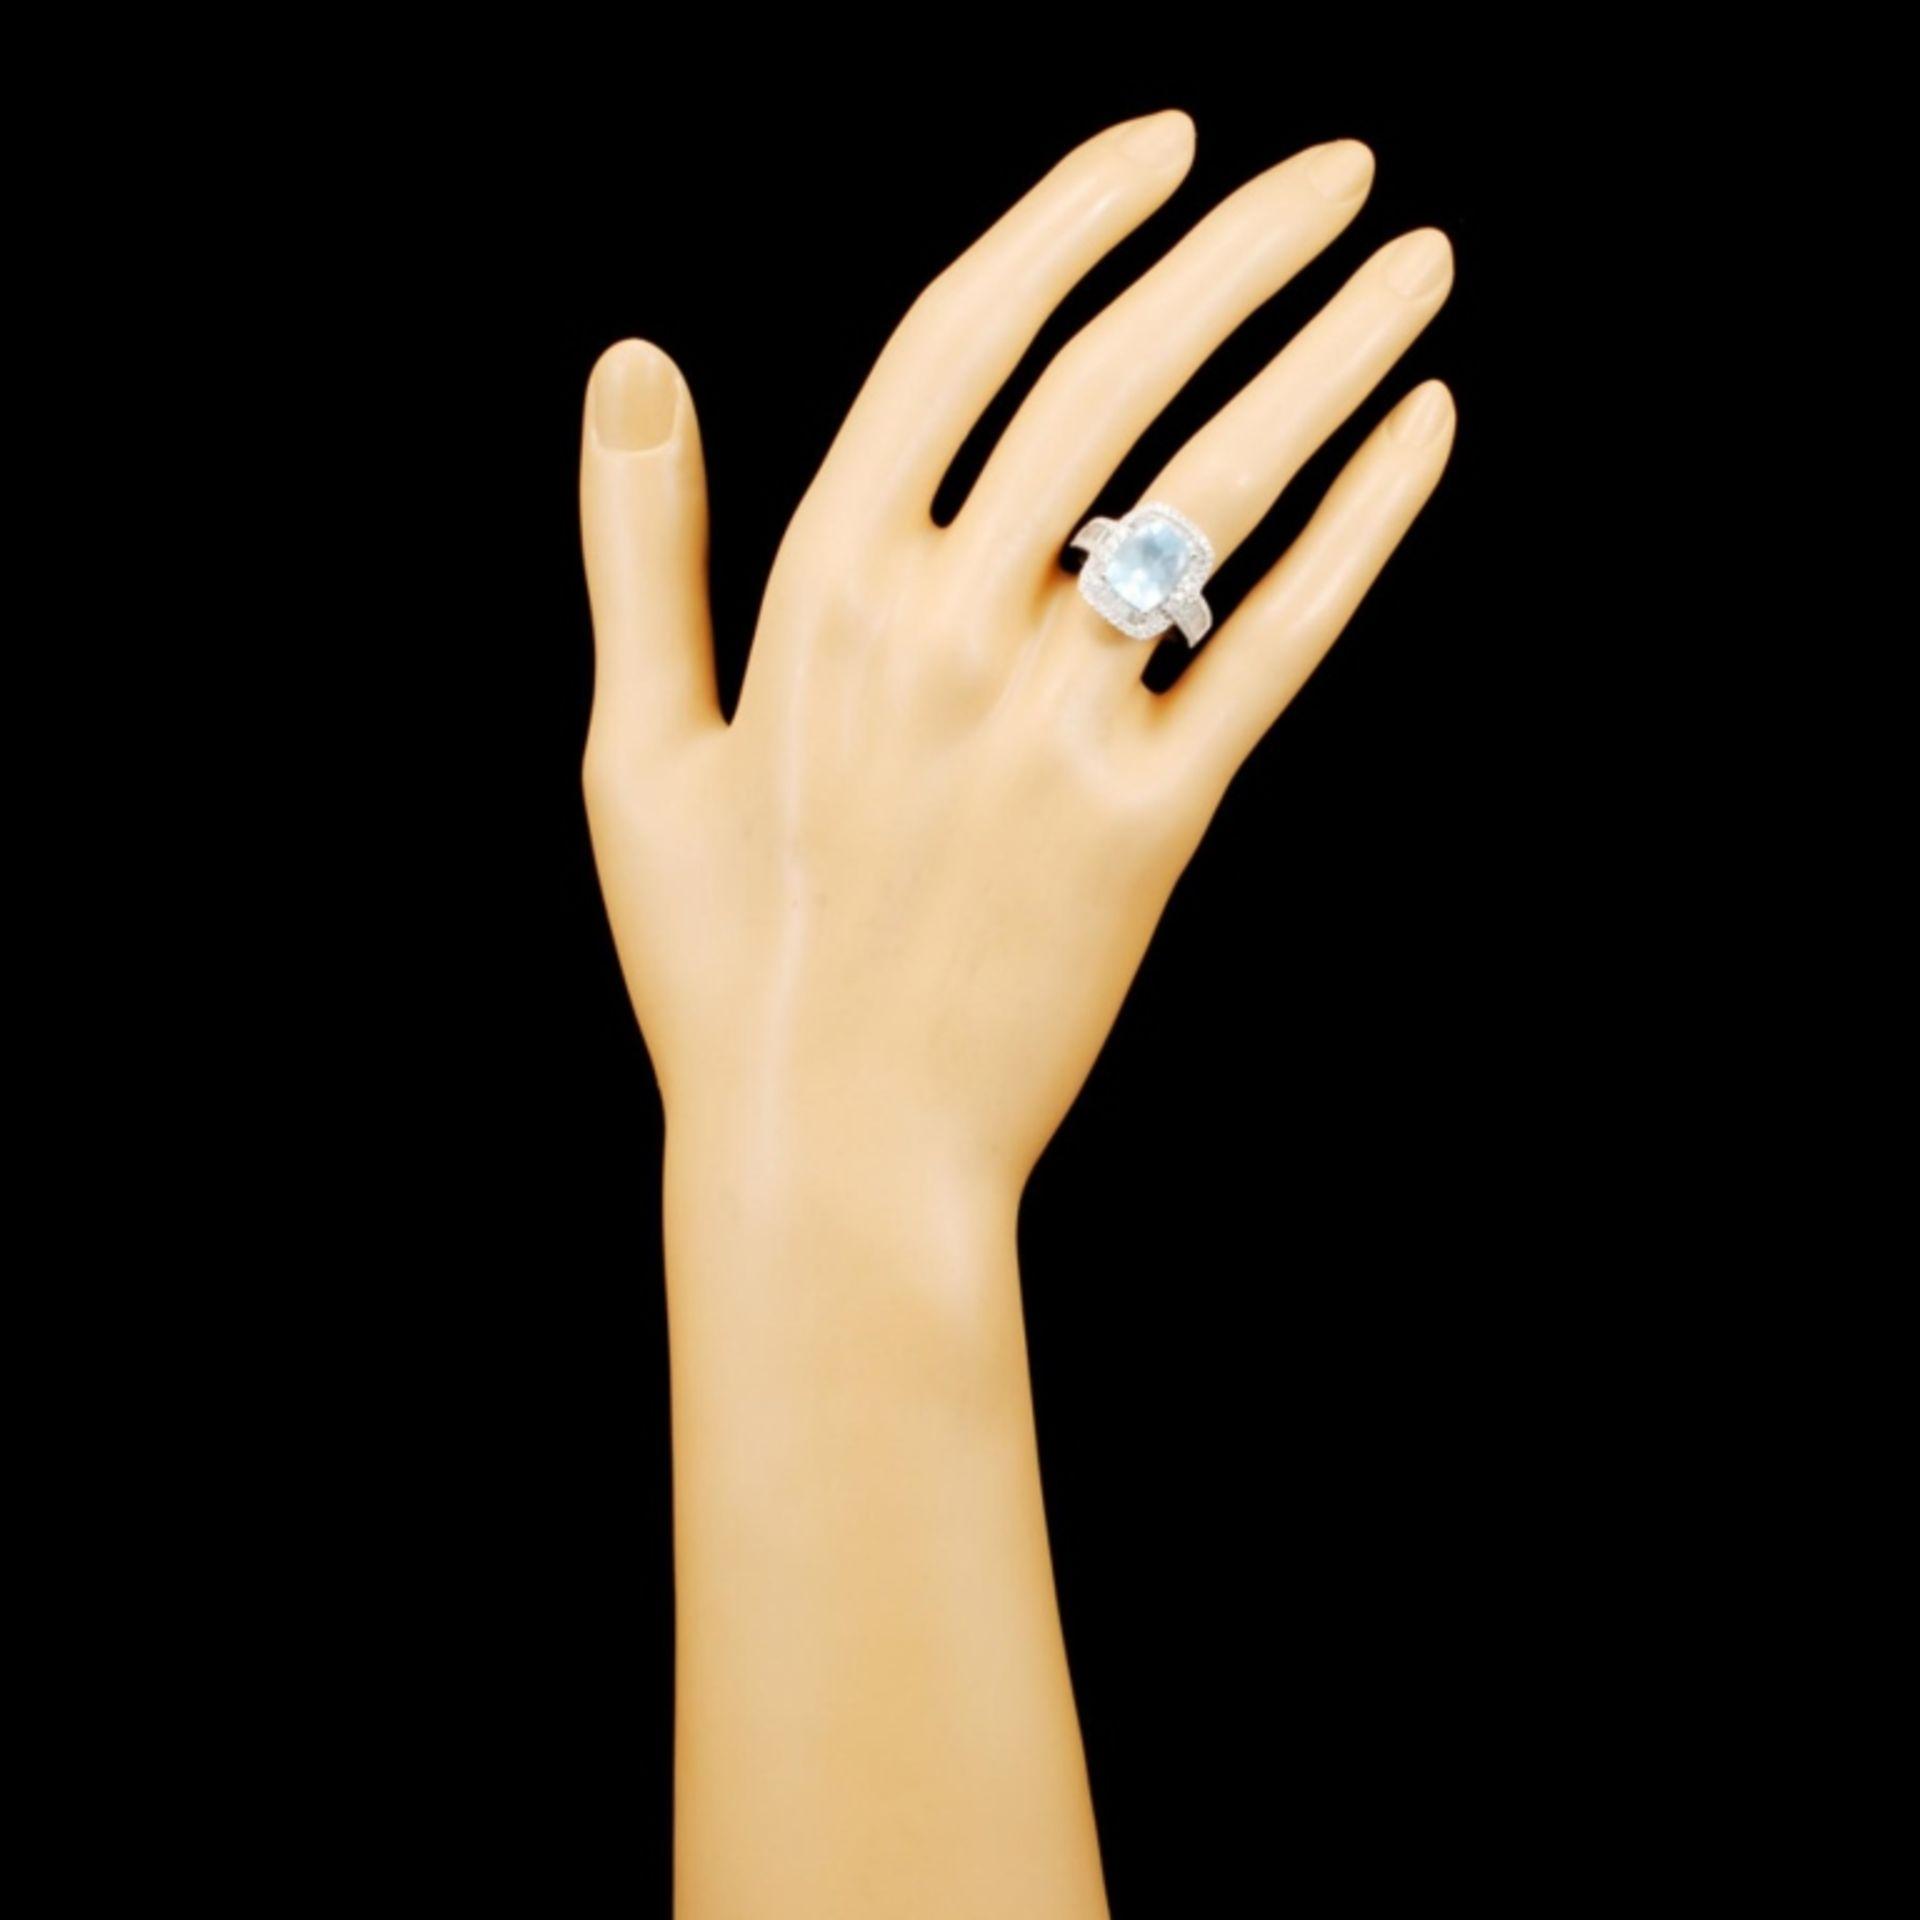 14K Gold 3.43ct Aquamarine & 1.30ctw Diamond Ring - Image 4 of 5